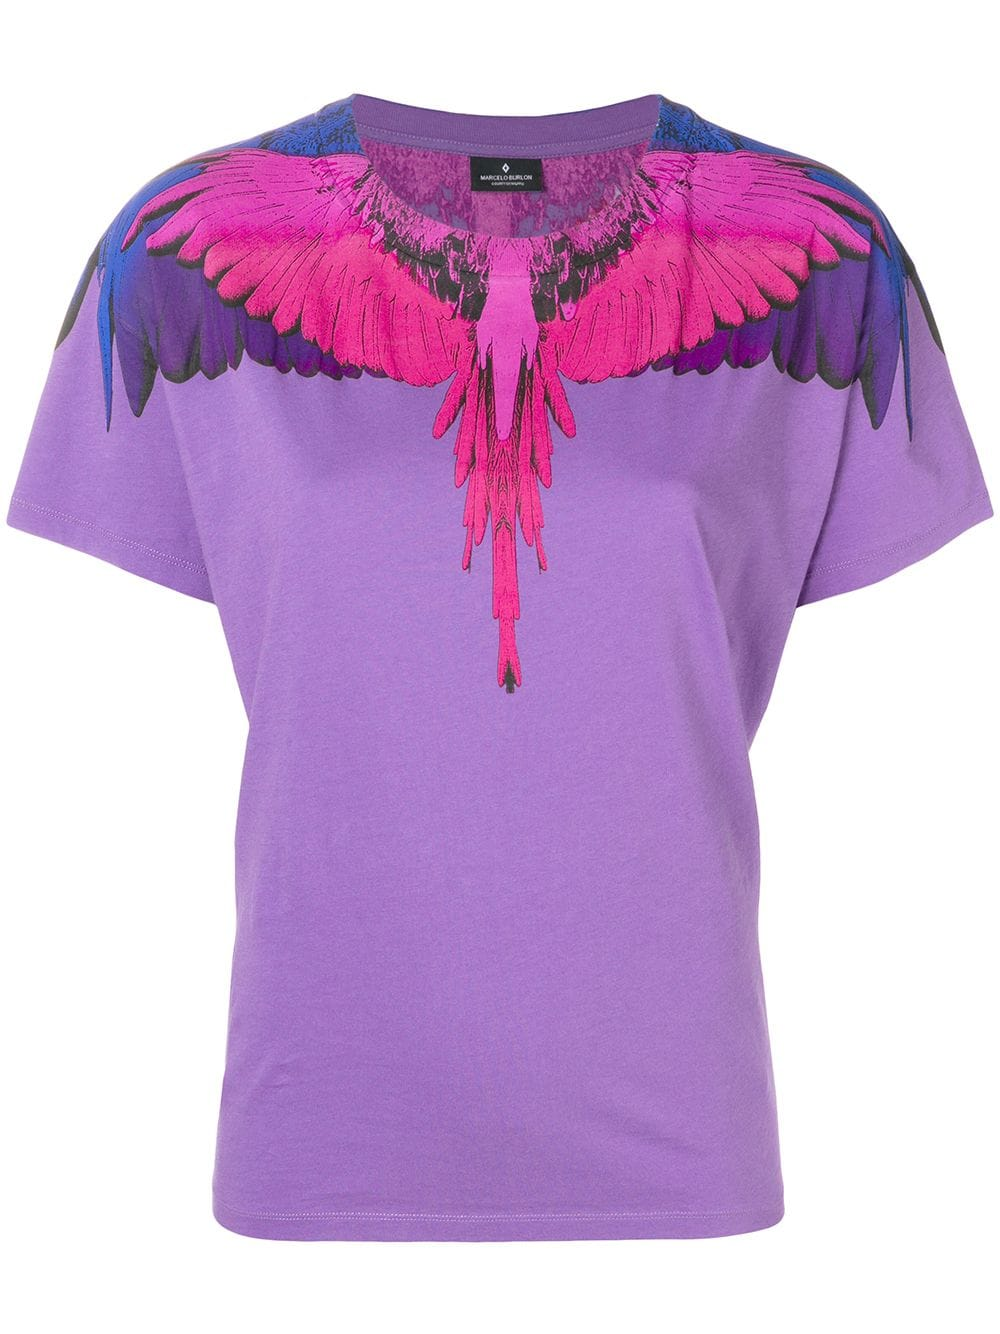 Marcelo Burlon County of Milan   Purple Wing Shirt